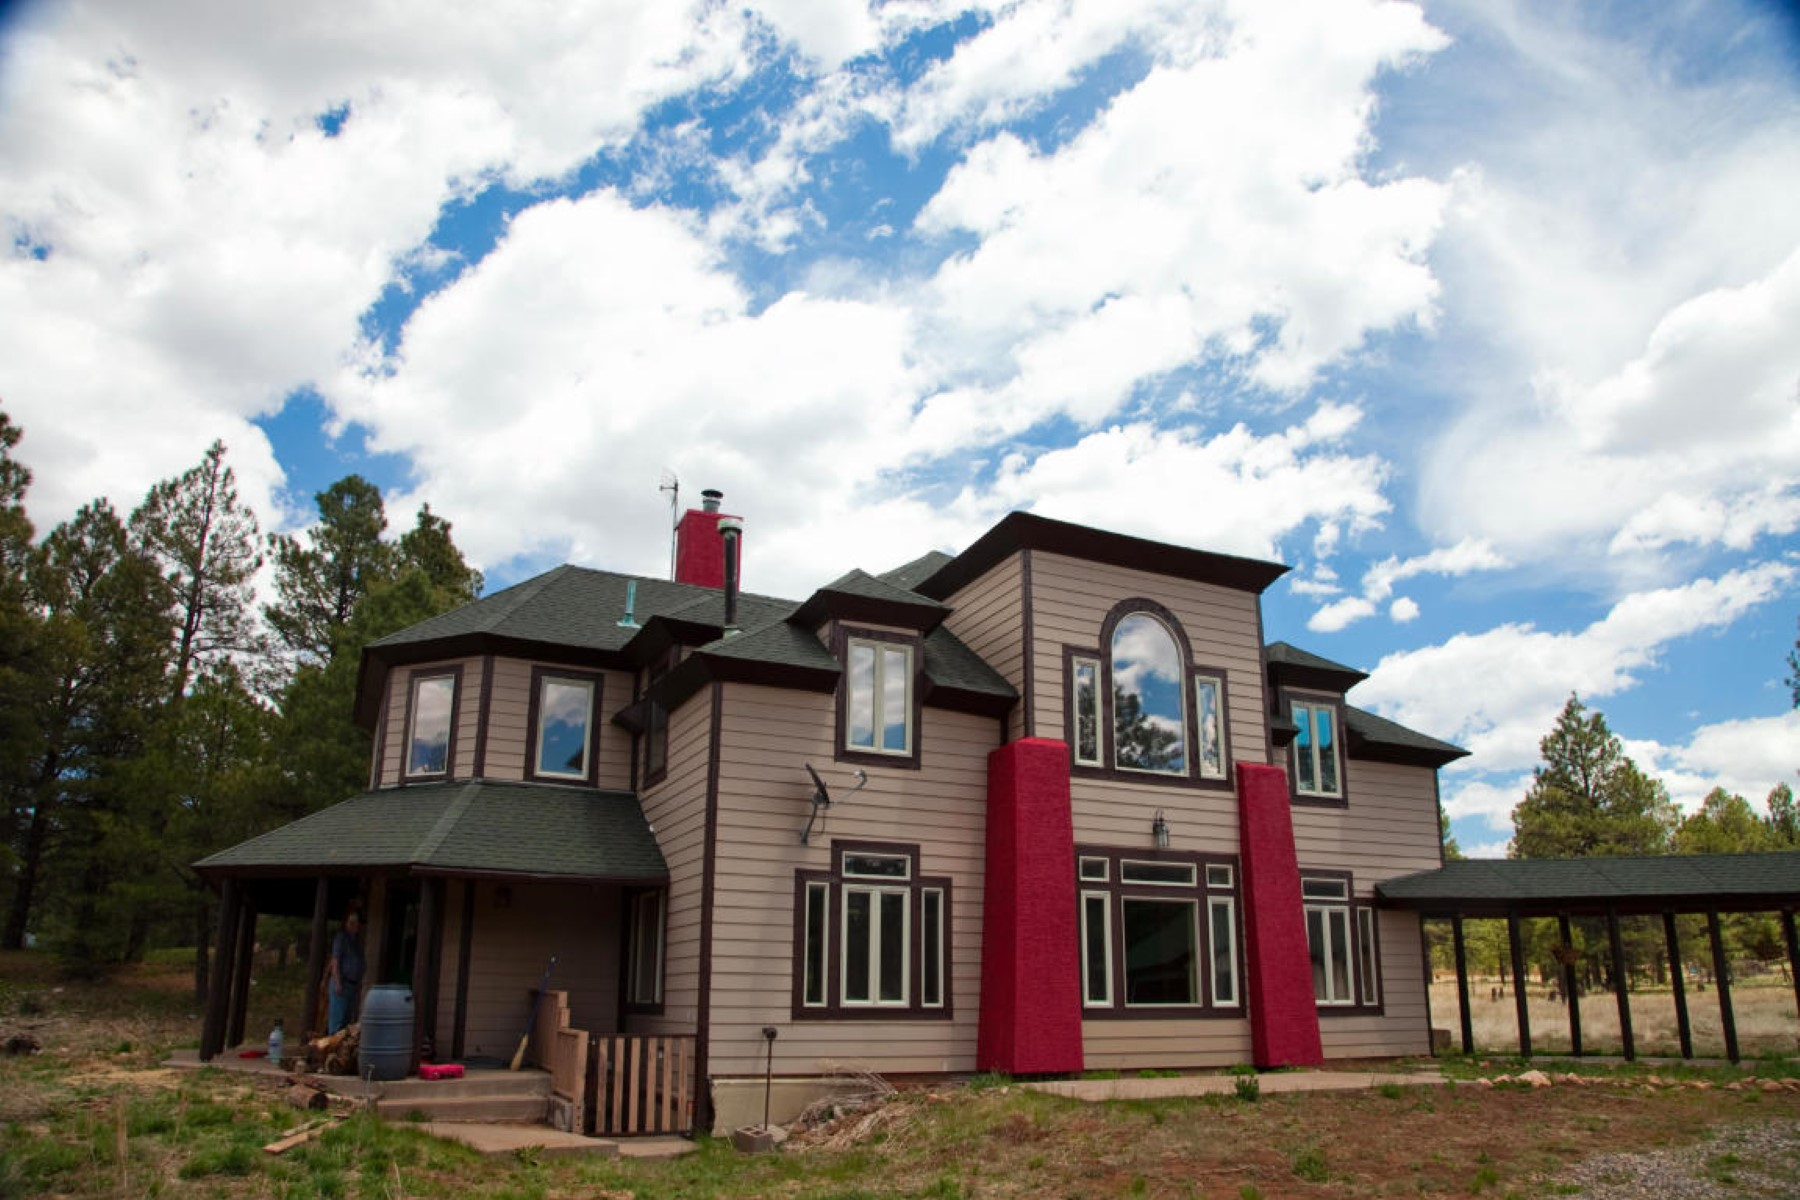 Maison unifamiliale pour l Vente à Completely remodeled one-of-a-kind luxury custom home 1970 E Y X Ranch Rd Flagstaff, Arizona 86001 États-Unis